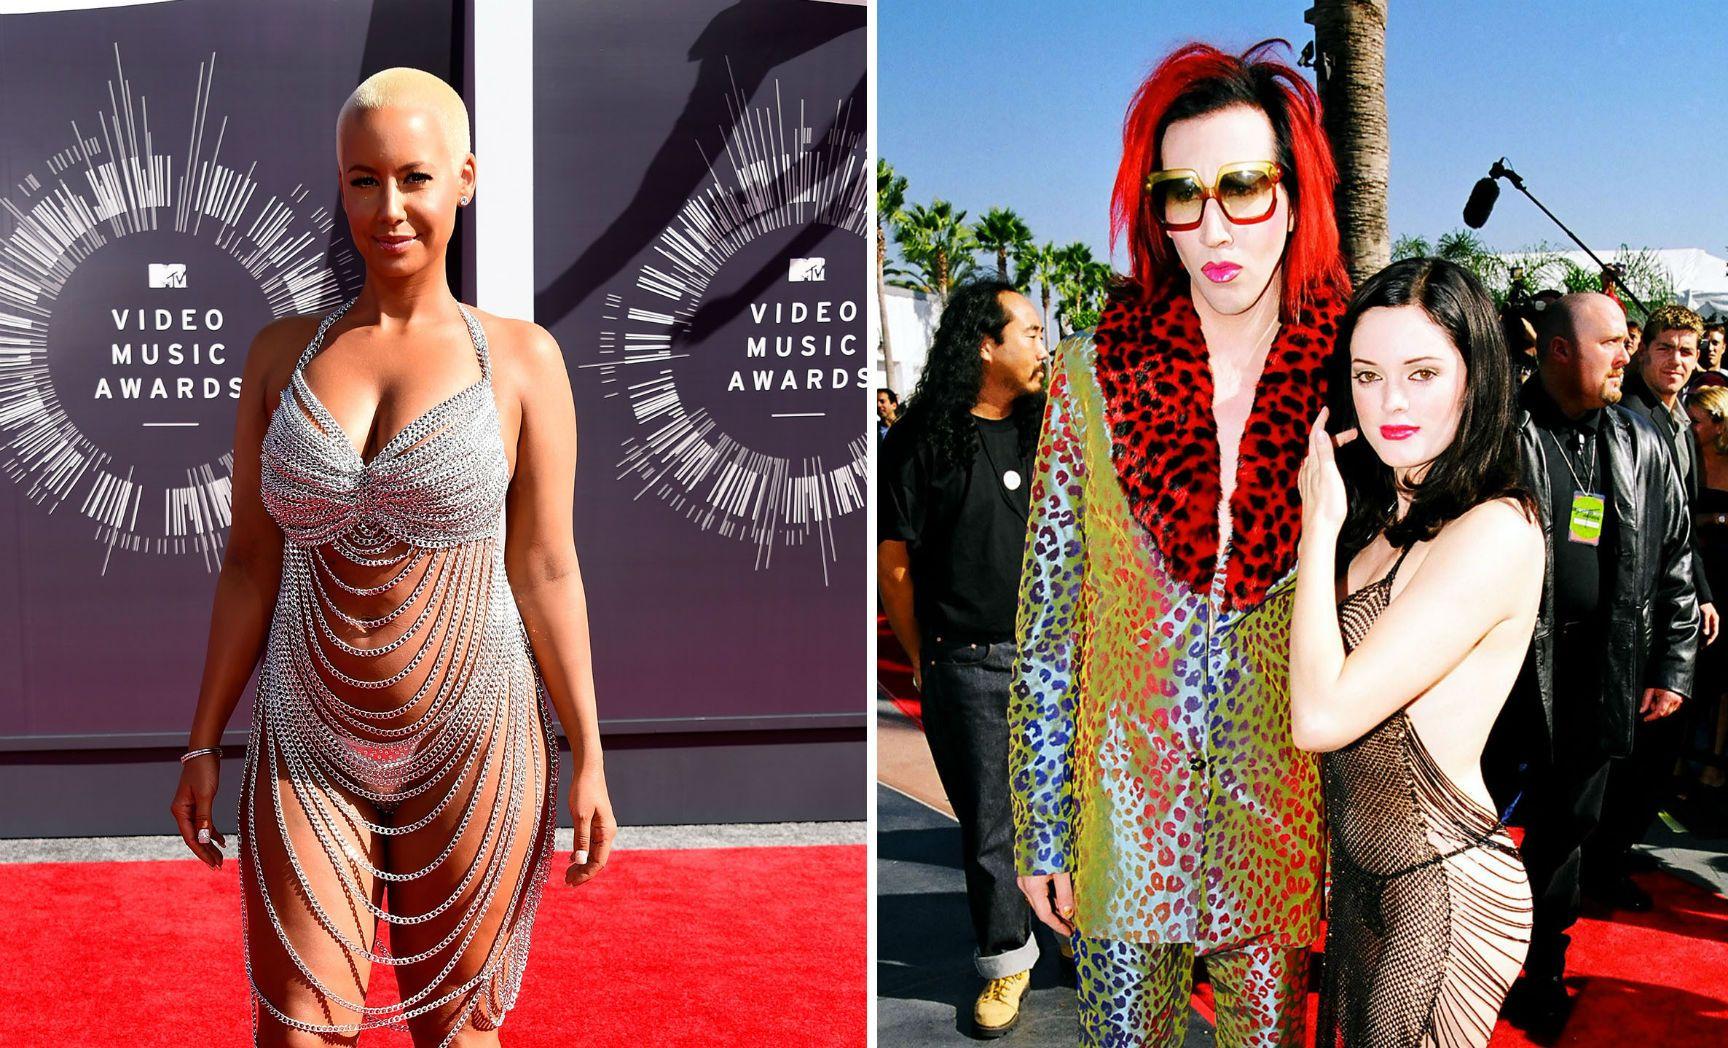 The 15 Most Scandalous Awards Show Dresses Ever